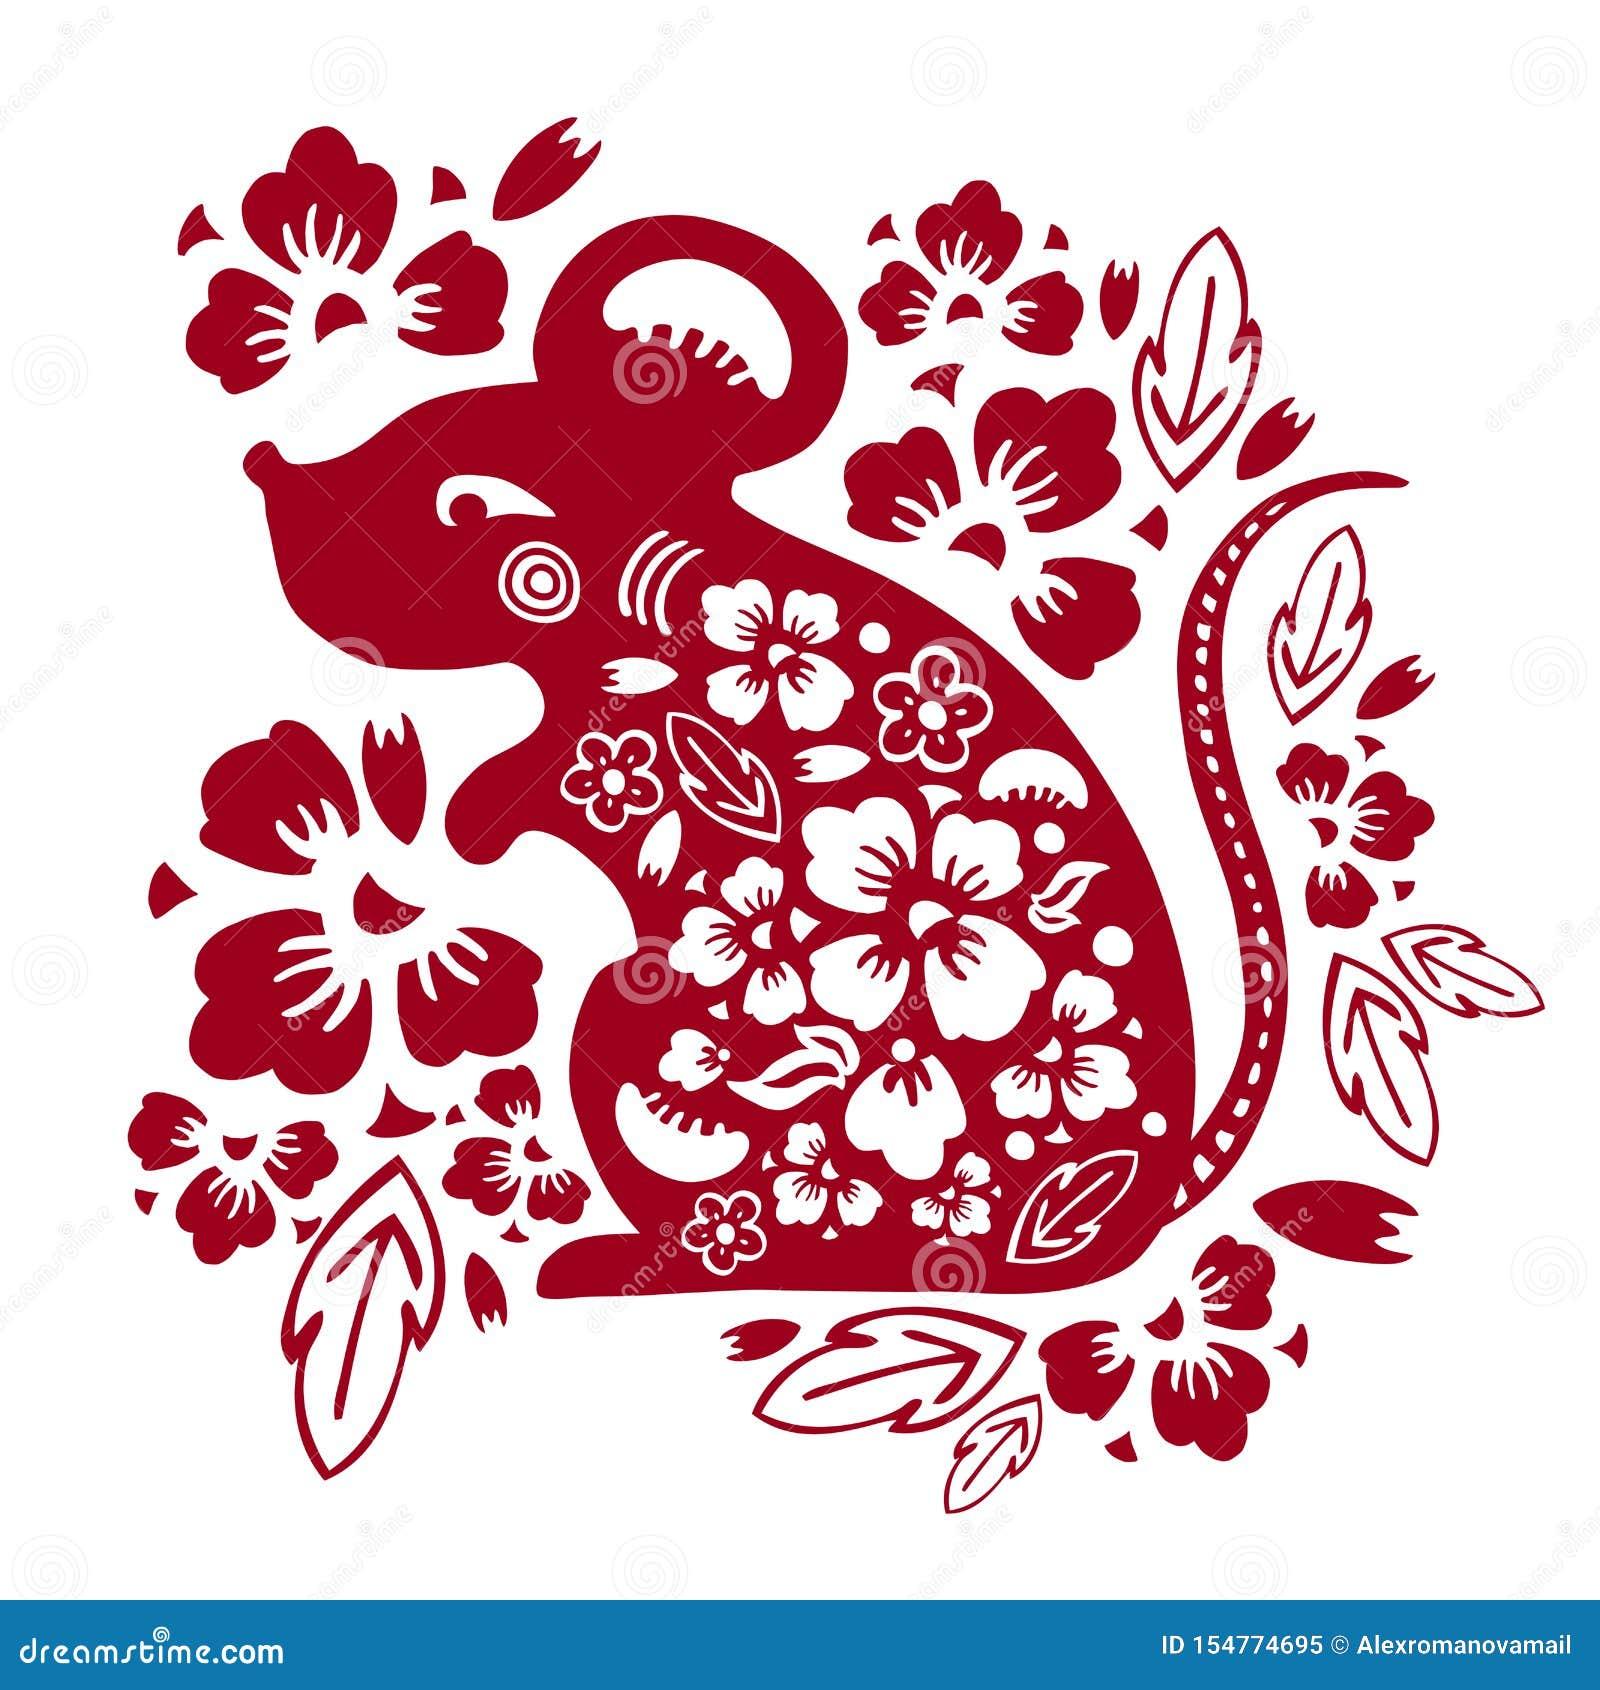 Chinese New Year 2020 Animal.Chinese New Year 2020 Vector Papercut Silhouette